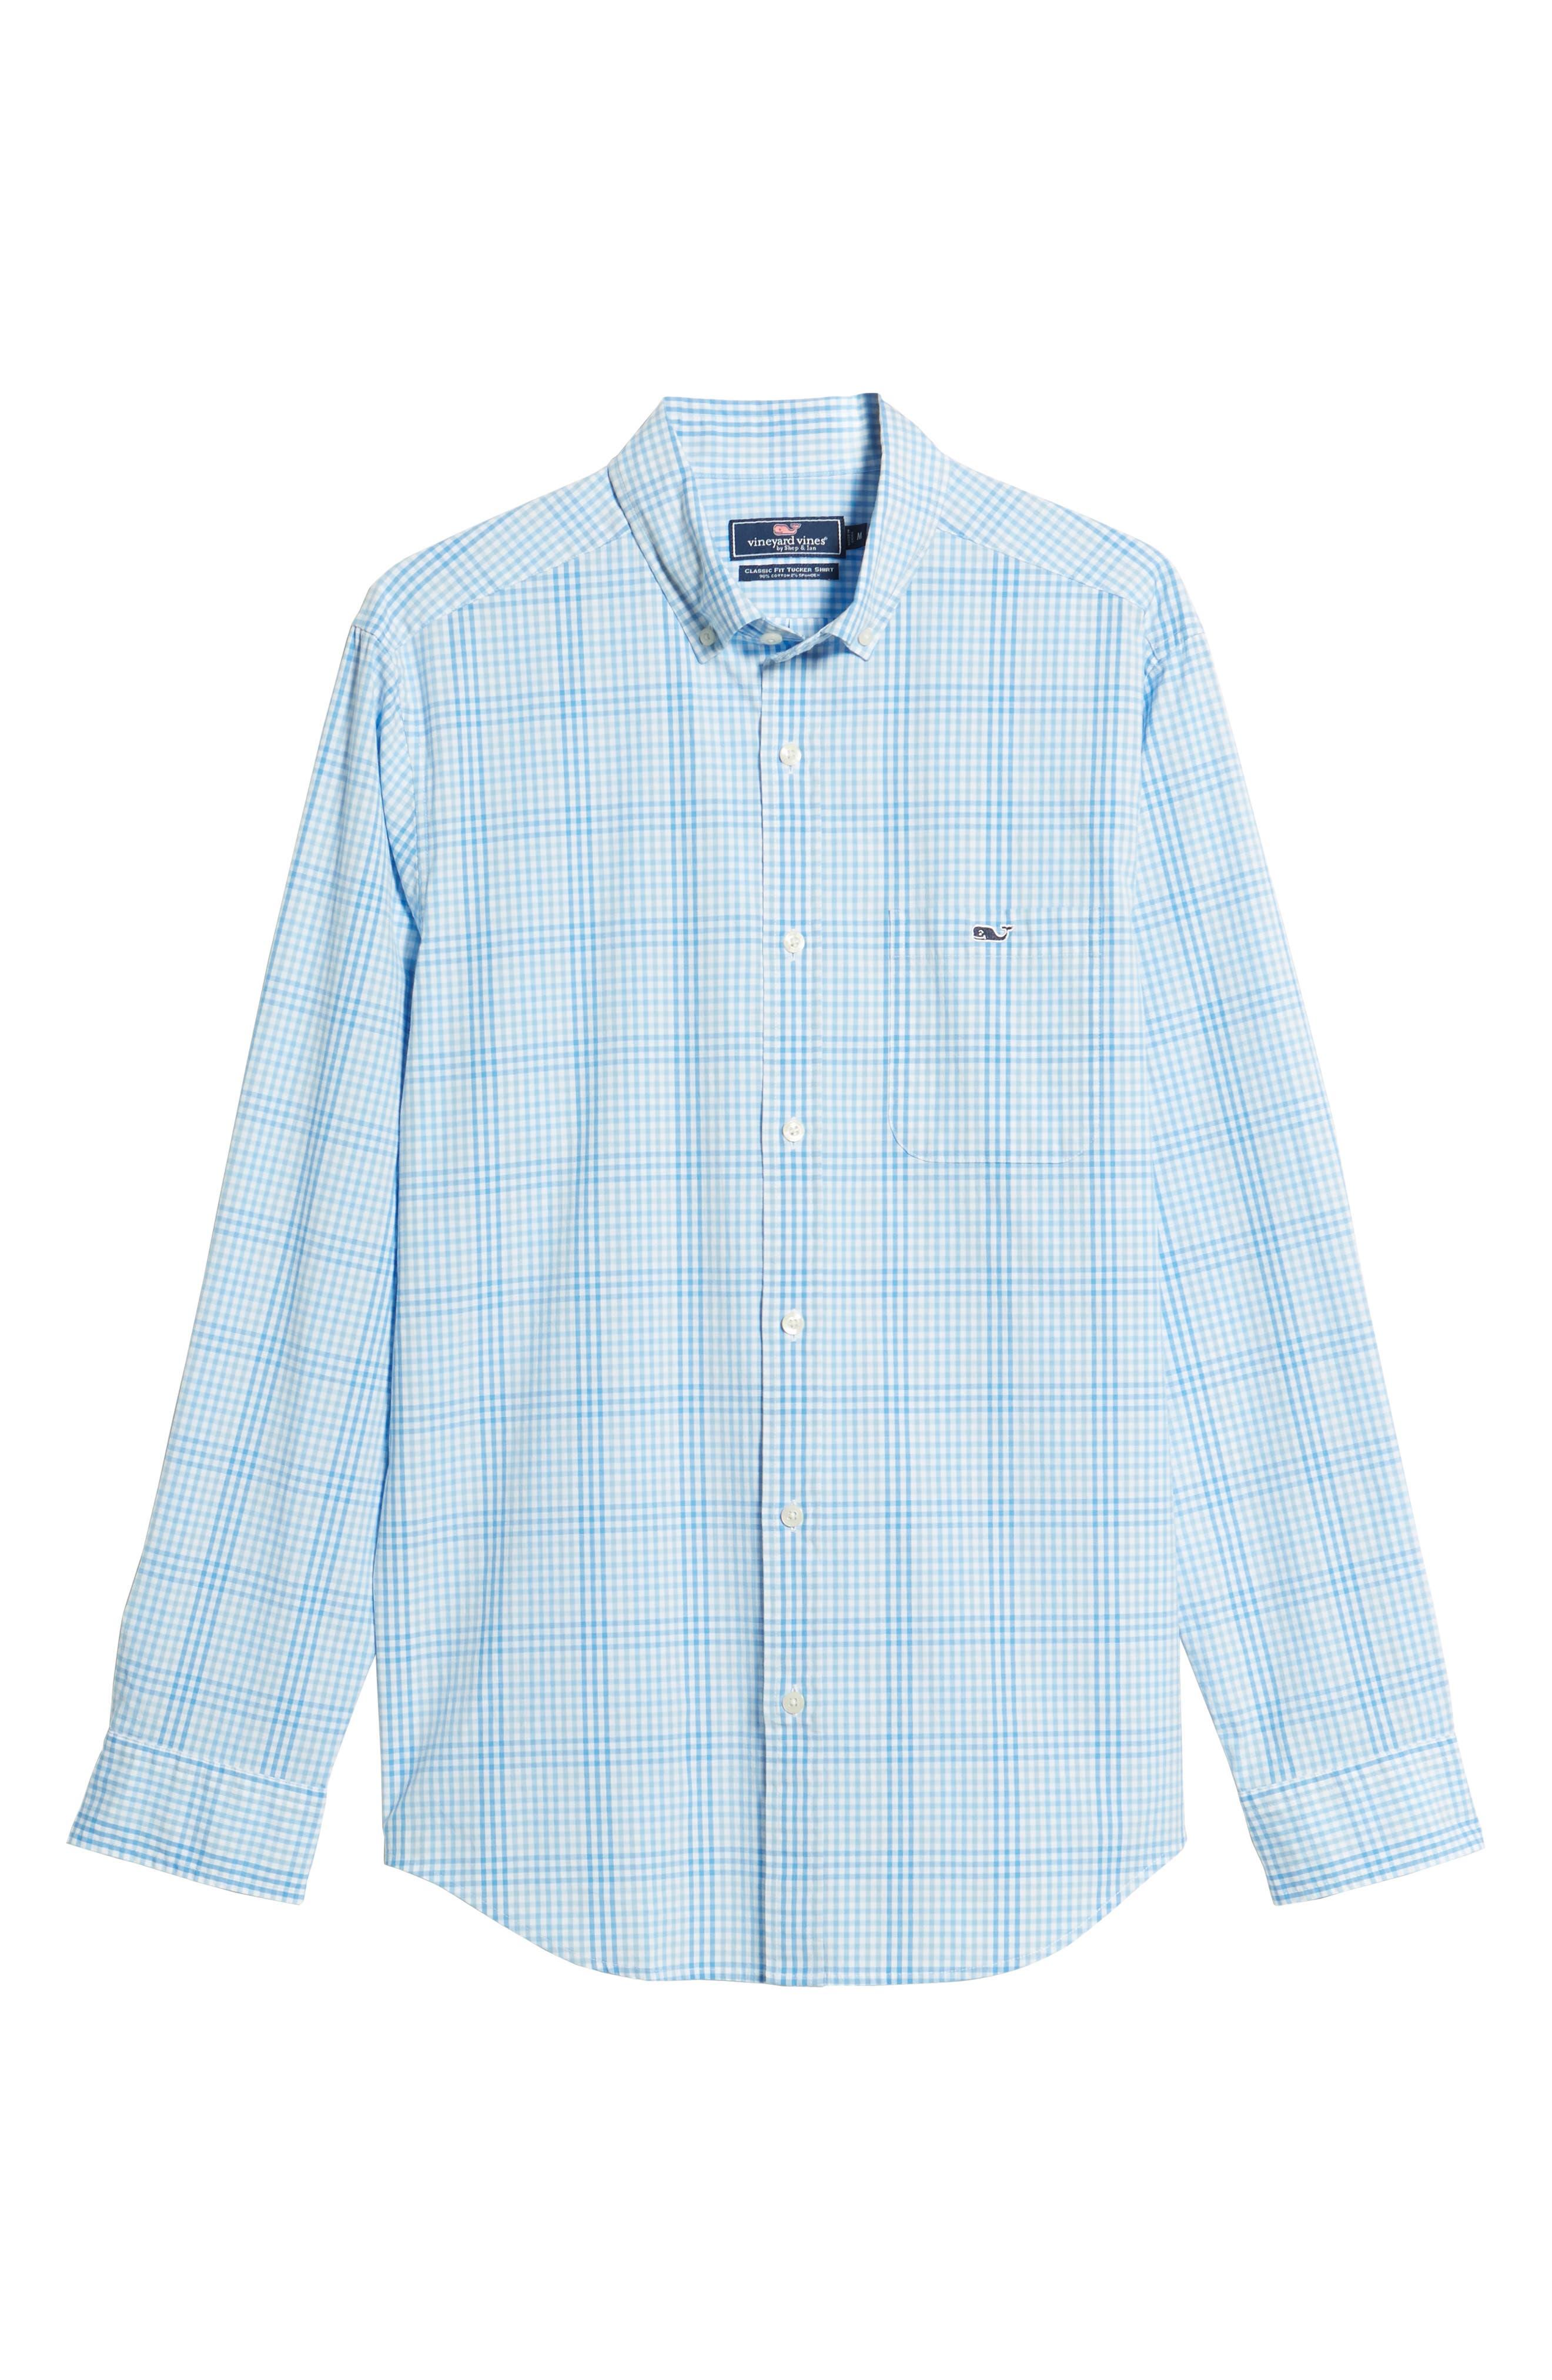 Ridge Hill Classic Fit Check Sport Shirt,                             Alternate thumbnail 6, color,                             Harbor Cay